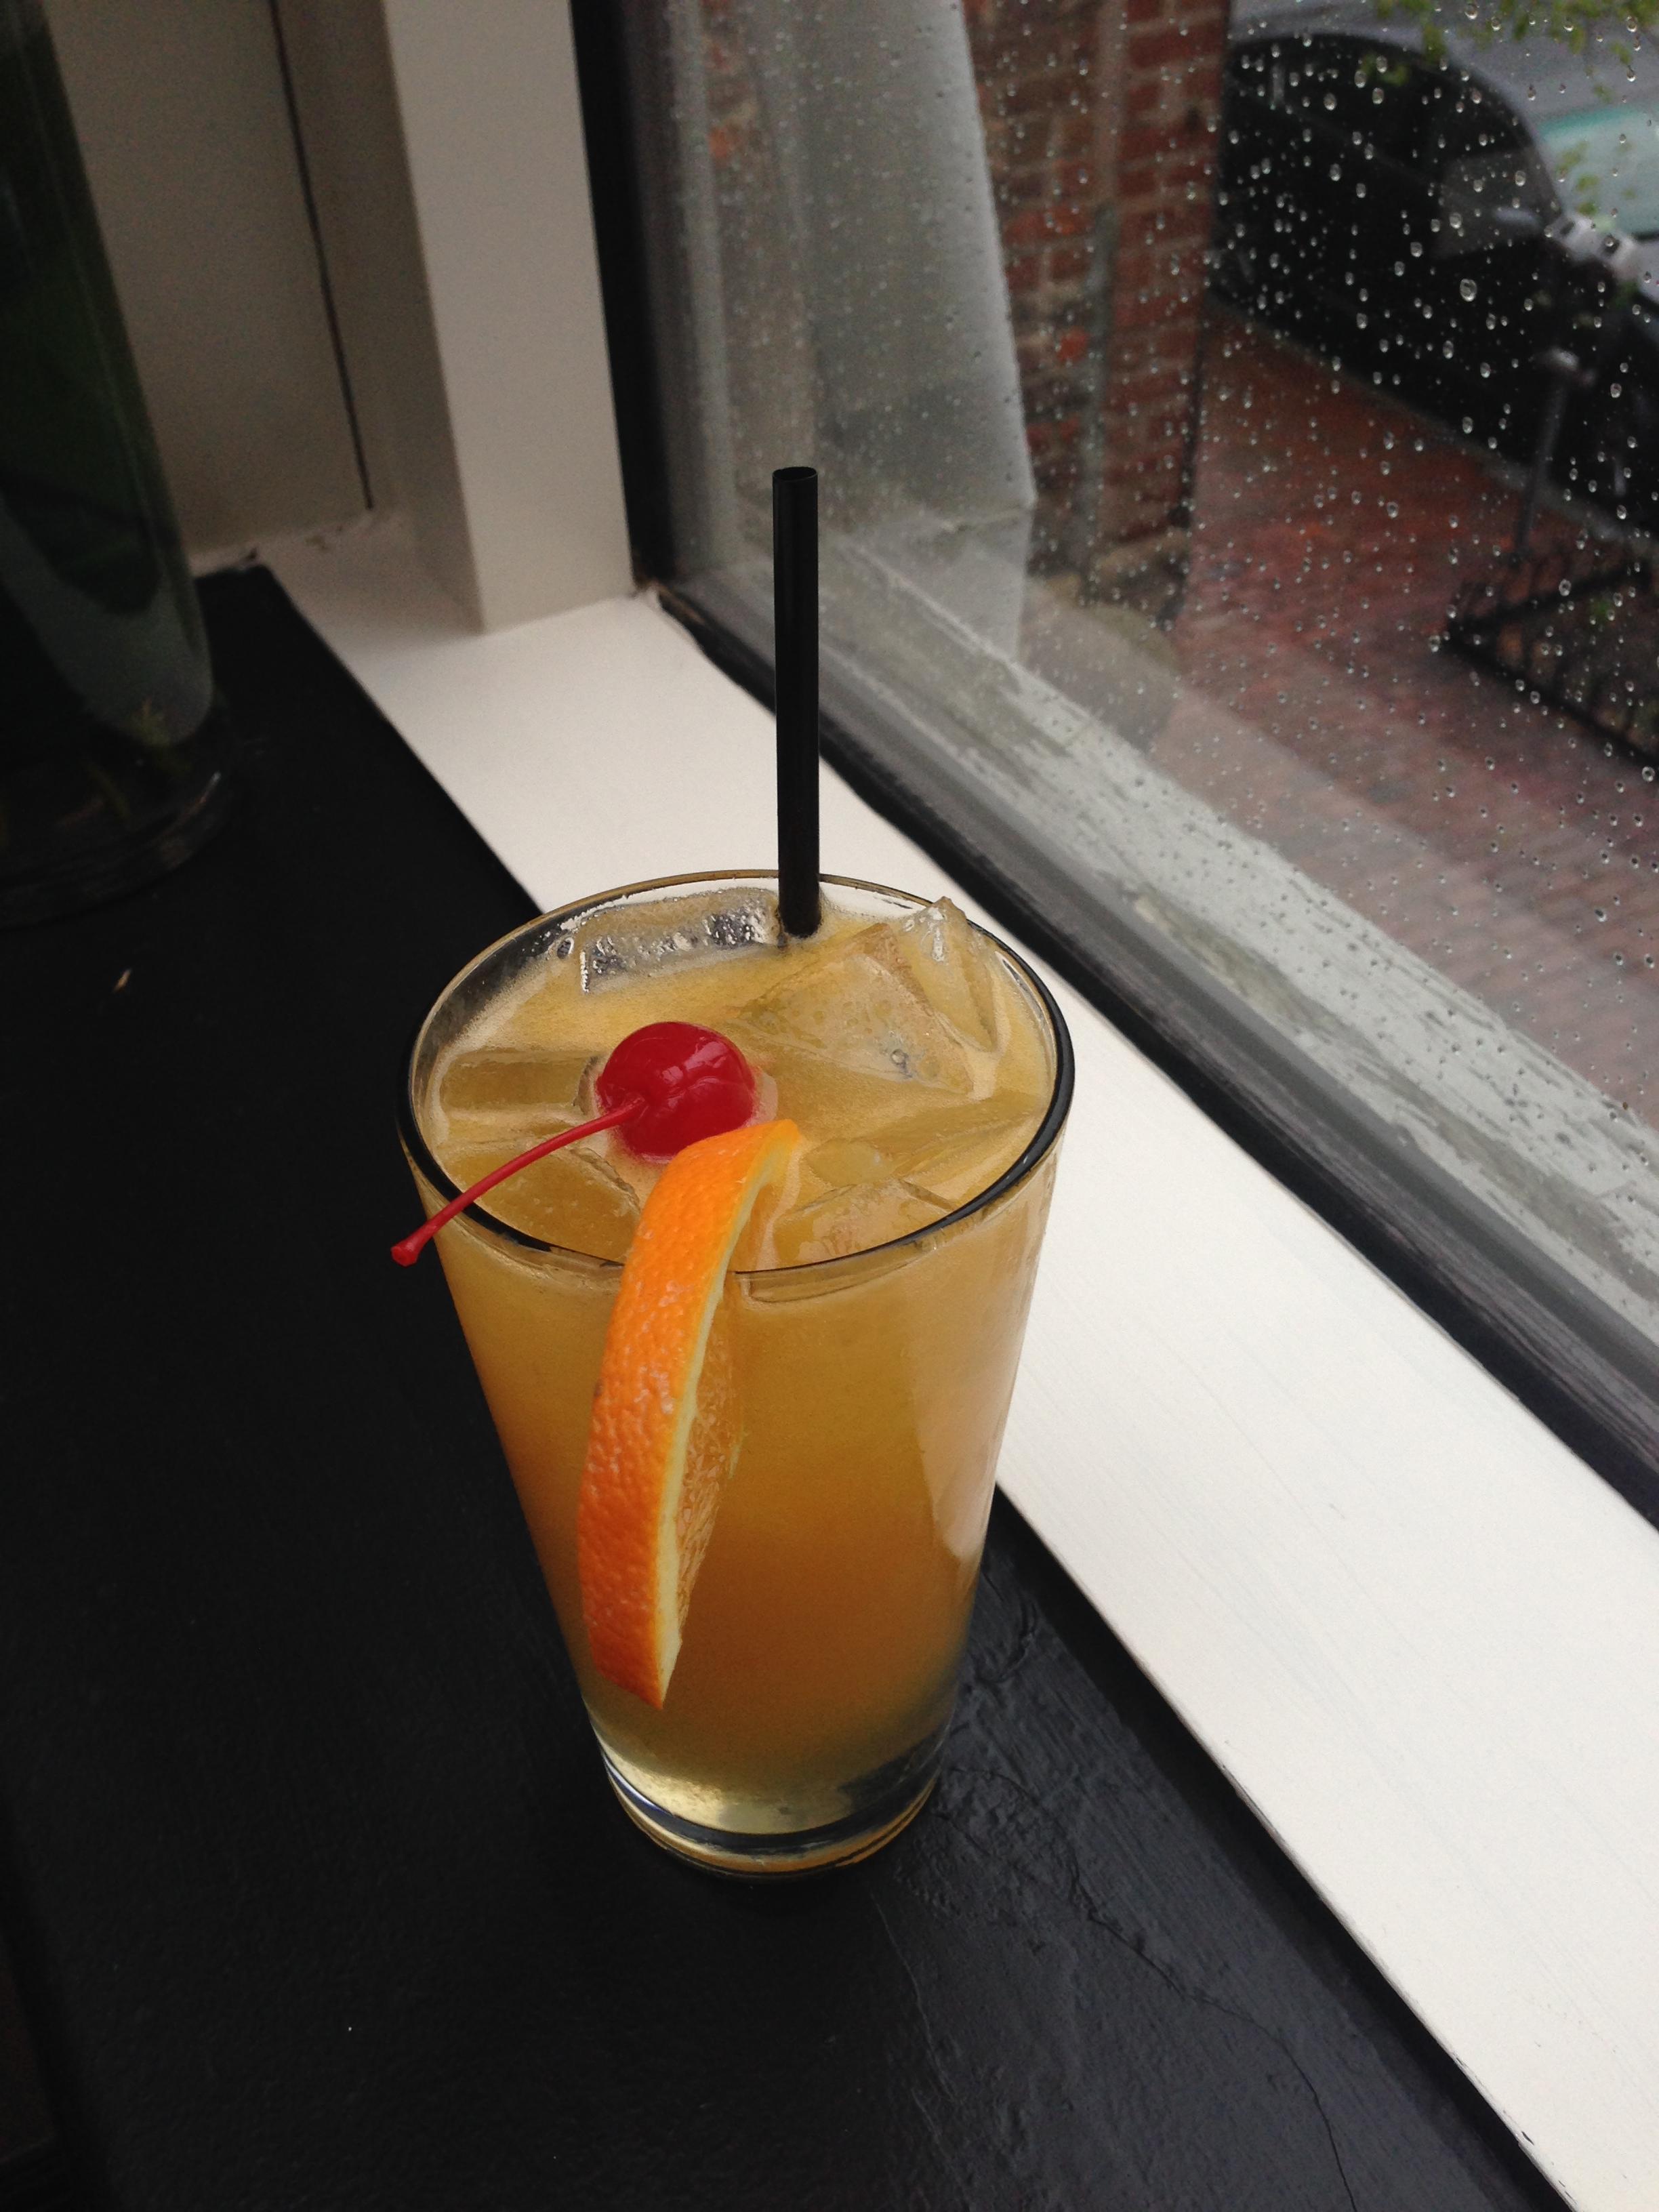 Mango-Orange Cocktail